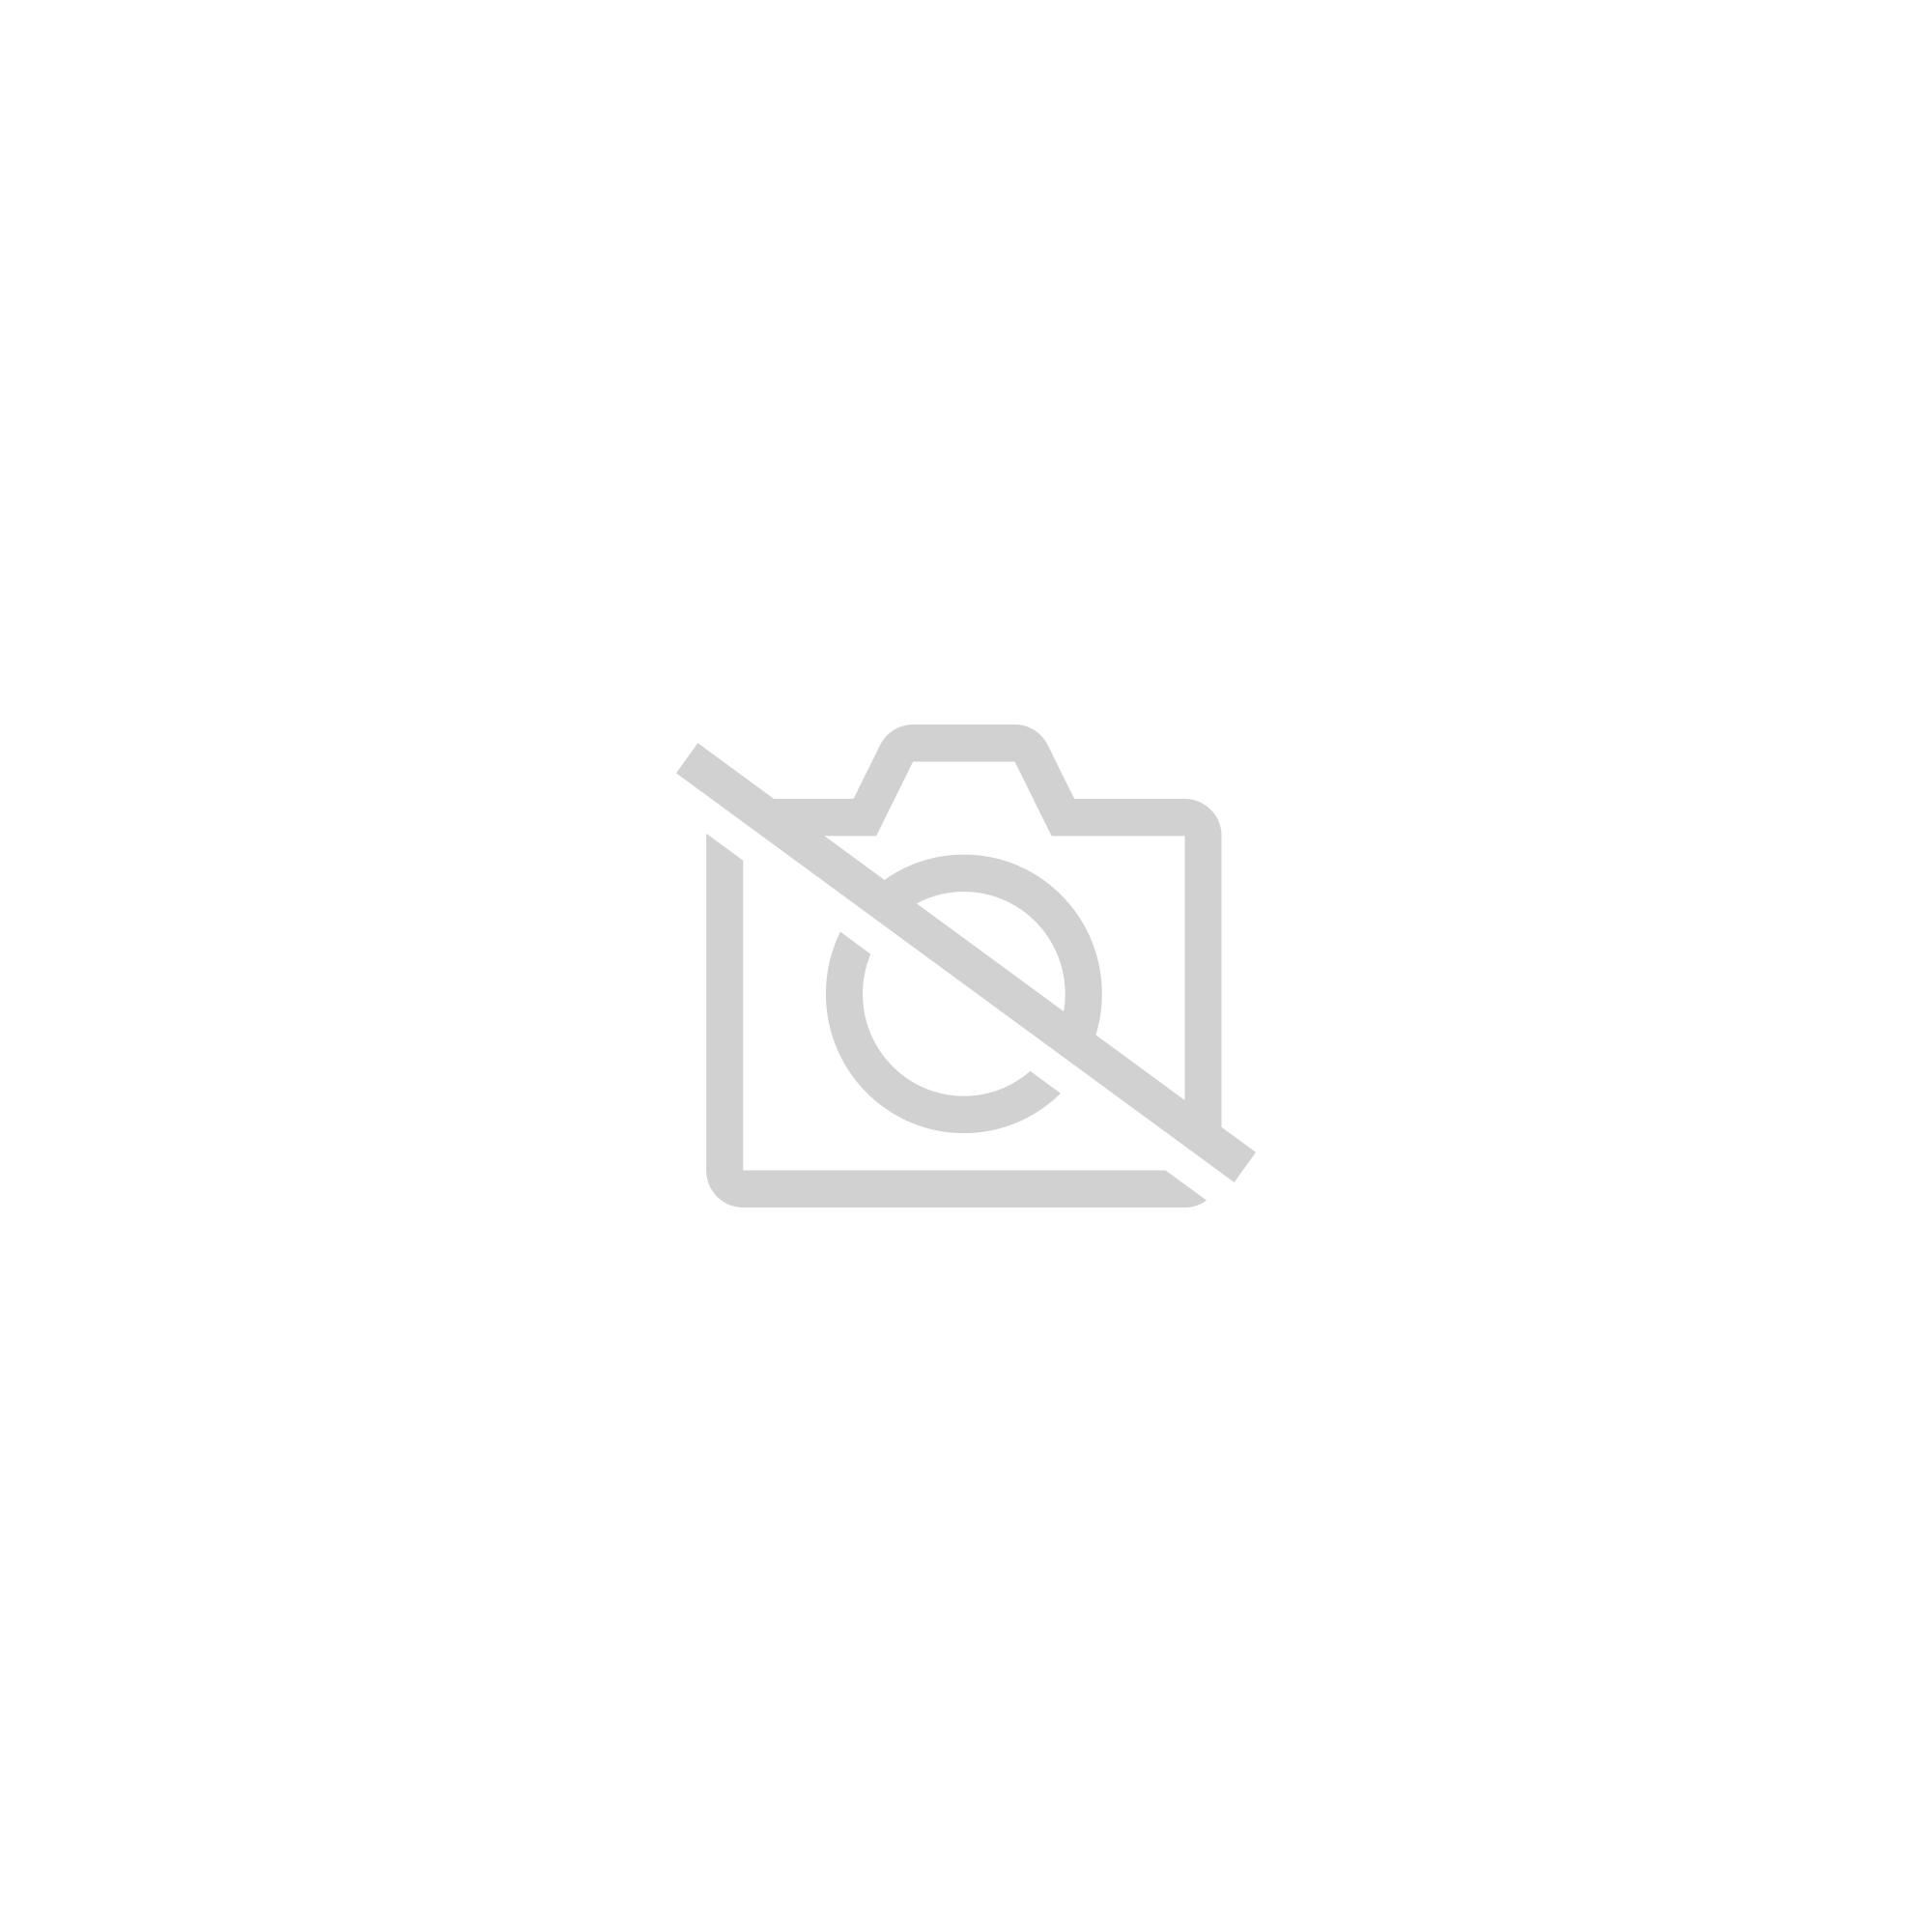 T shirt planet hollywood paris taille m achat et vente for Planet hollywood t shirt